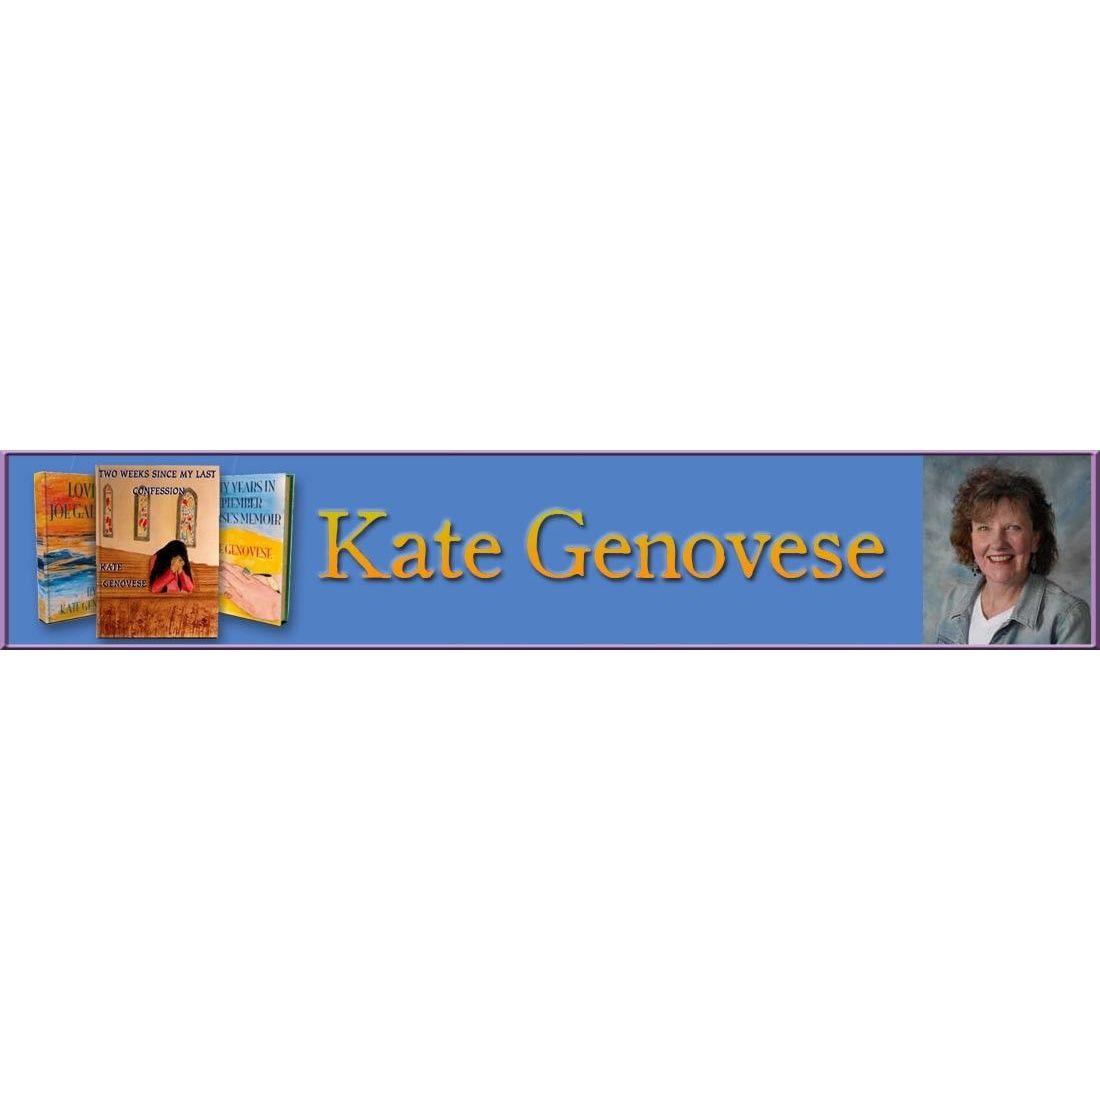 Kate Genovese Books - Woburn, MA 01801 - (781)883-4711 | ShowMeLocal.com